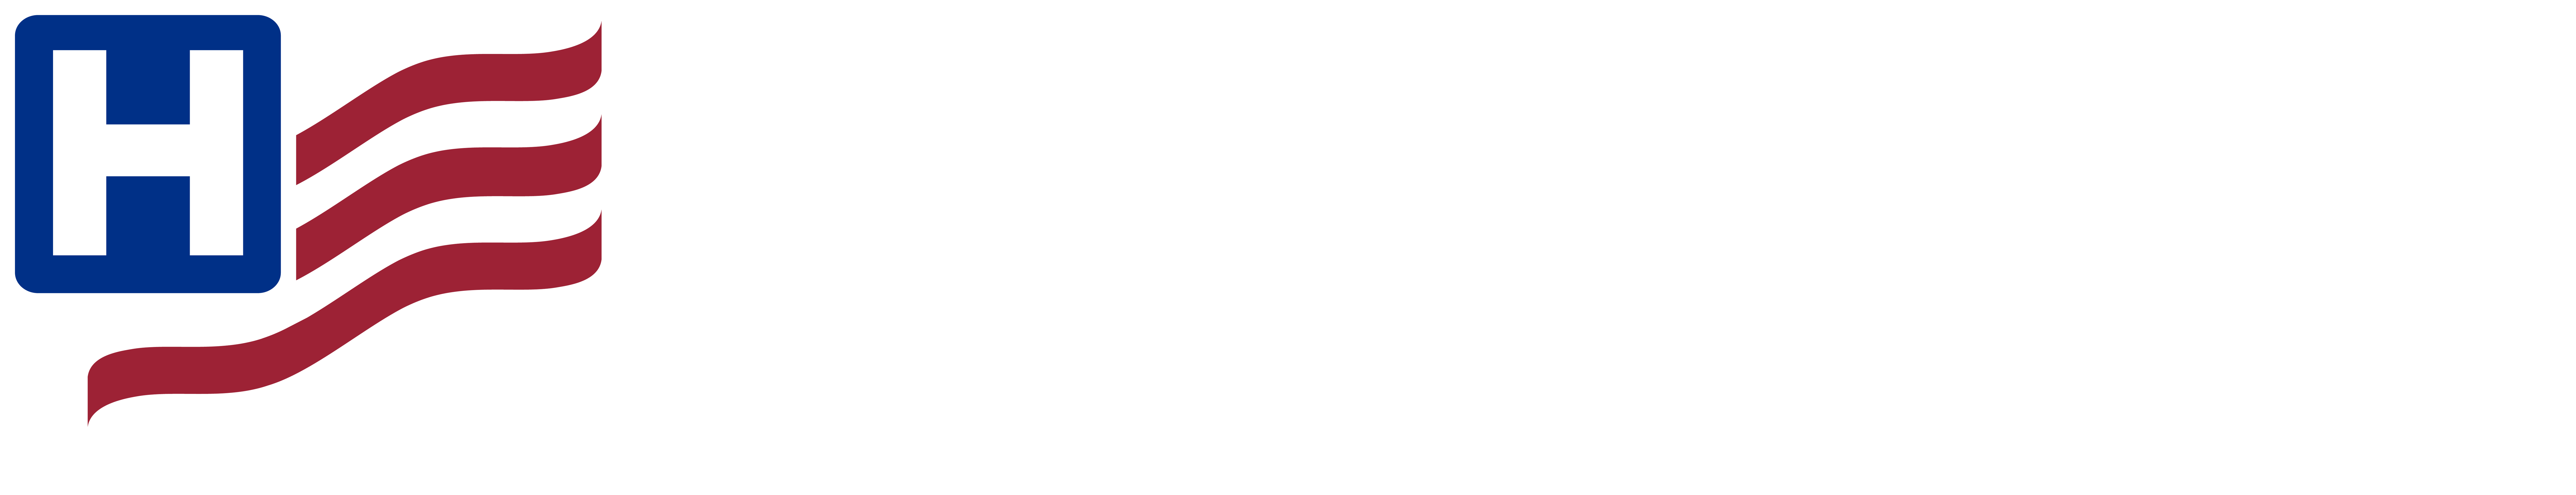 health-forum-tagline